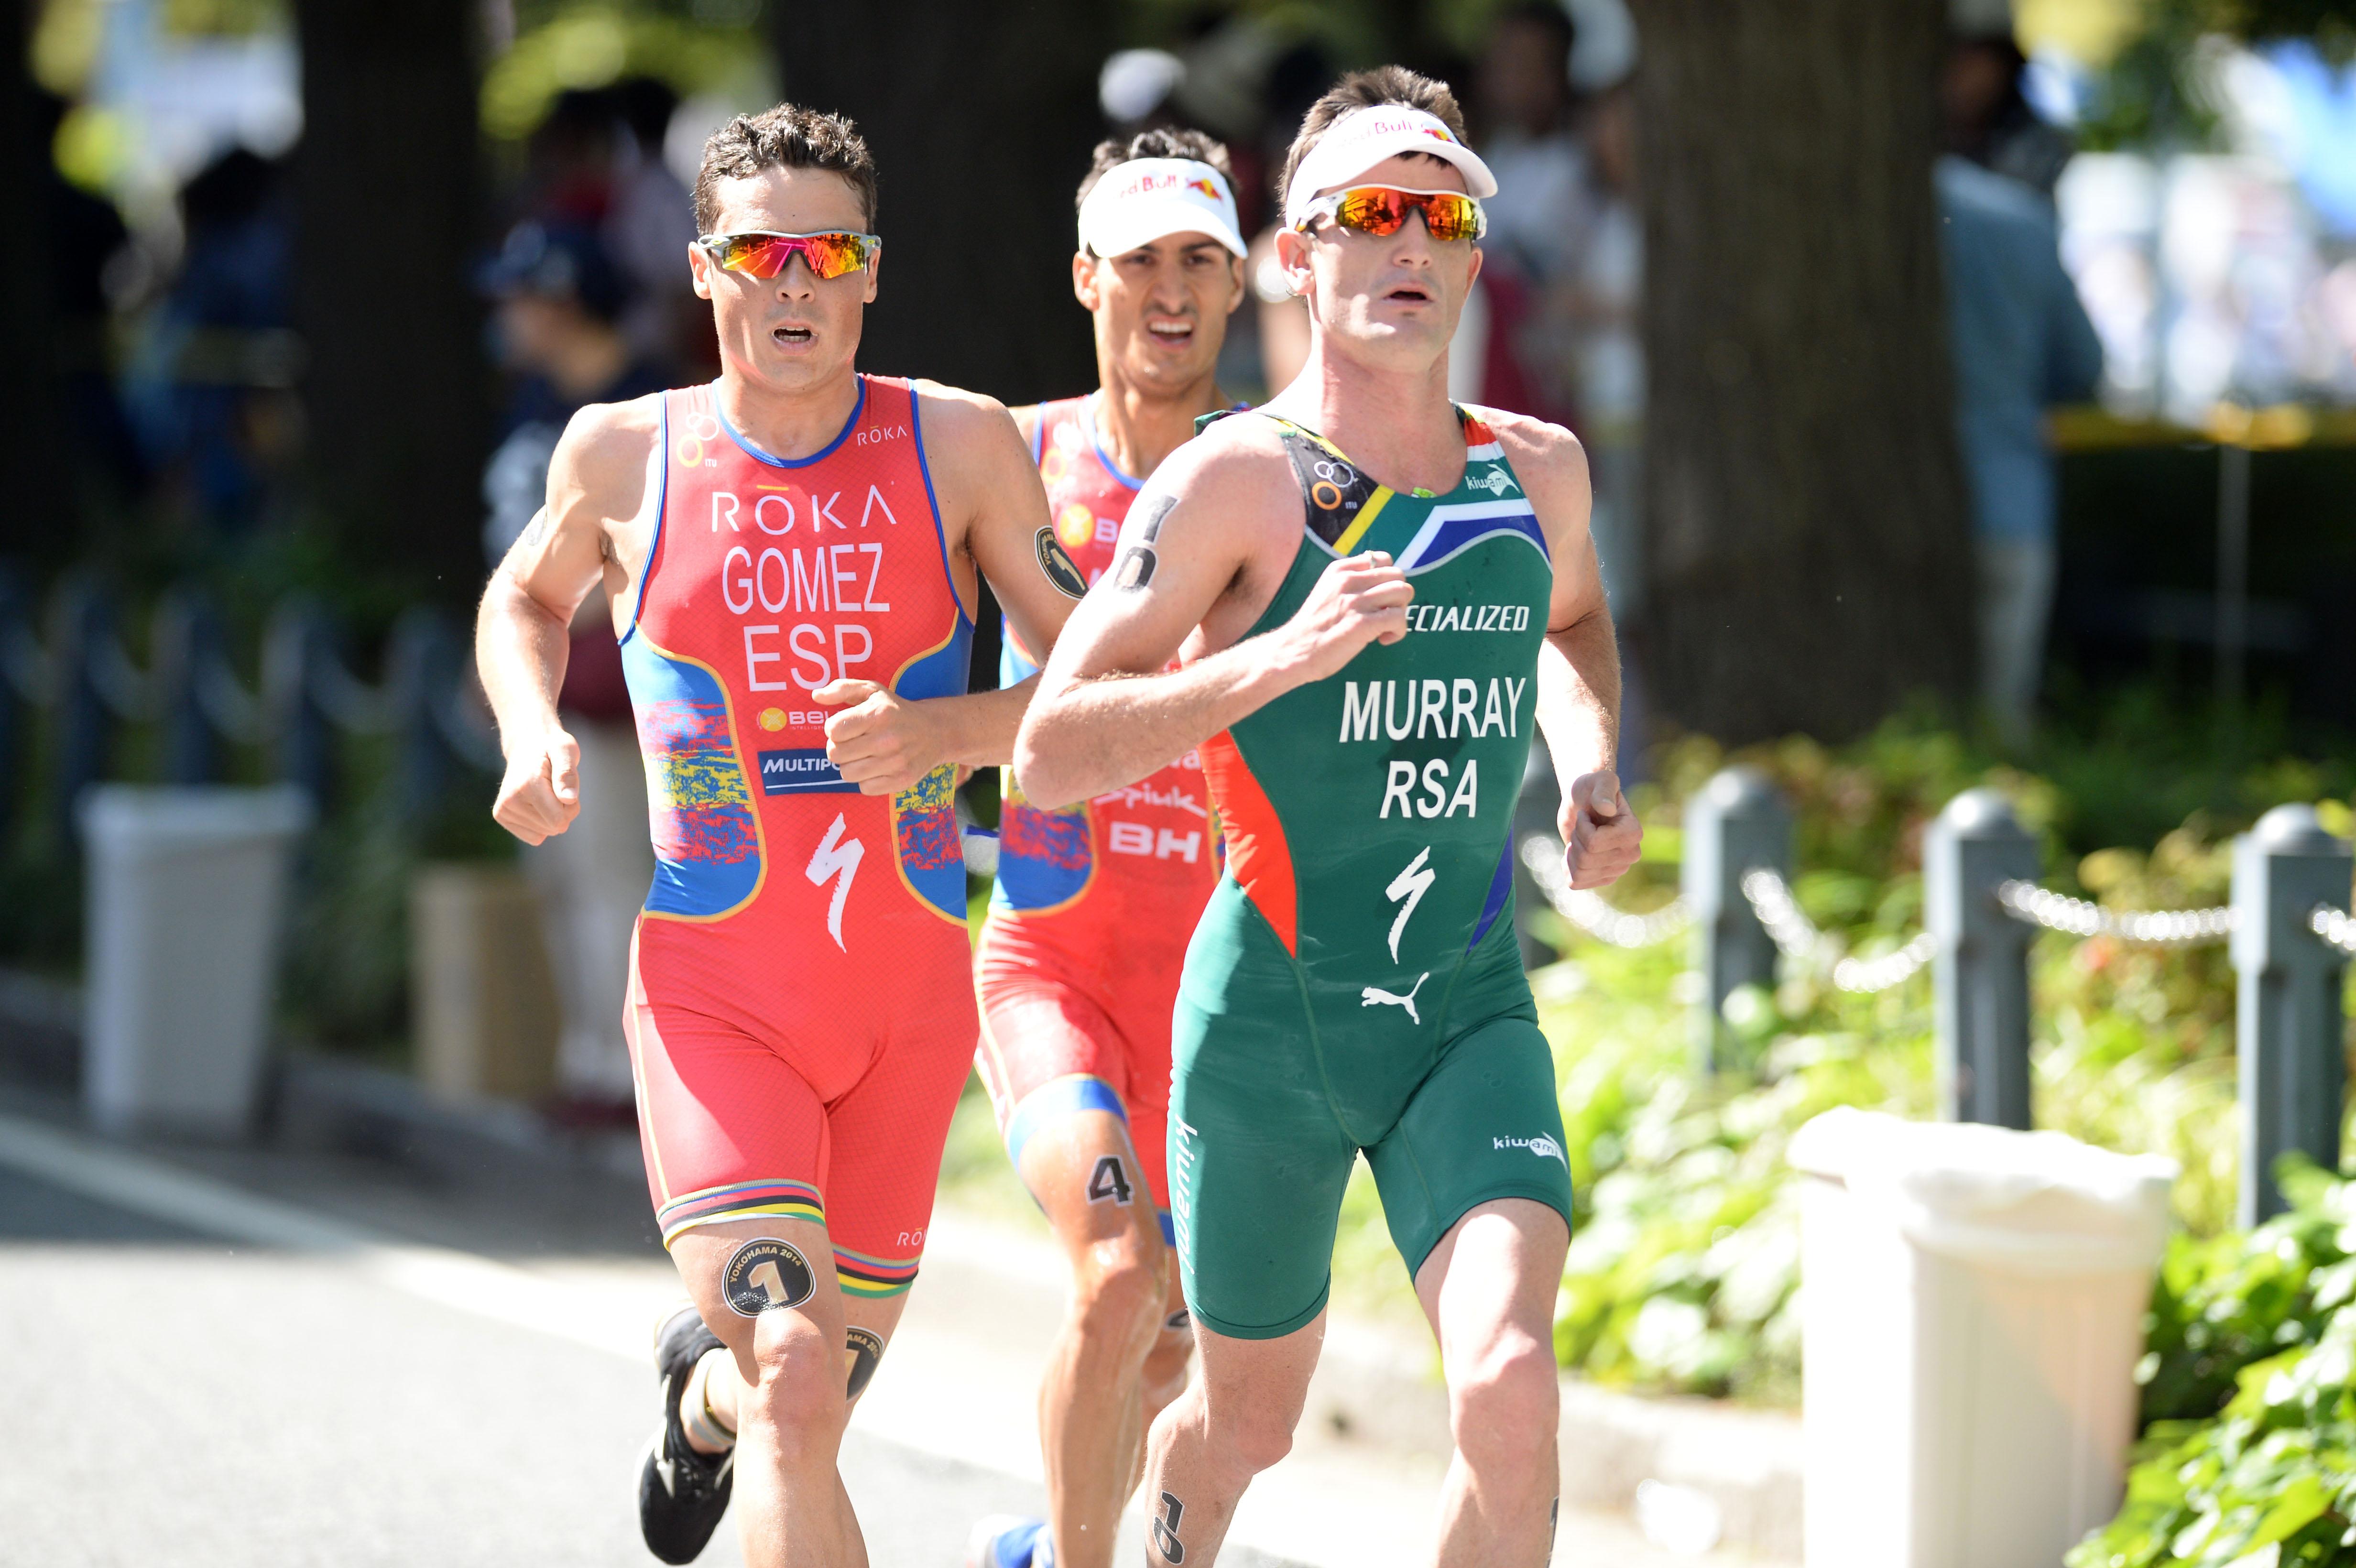 Medal hopeful Murray's last Games warm-up race